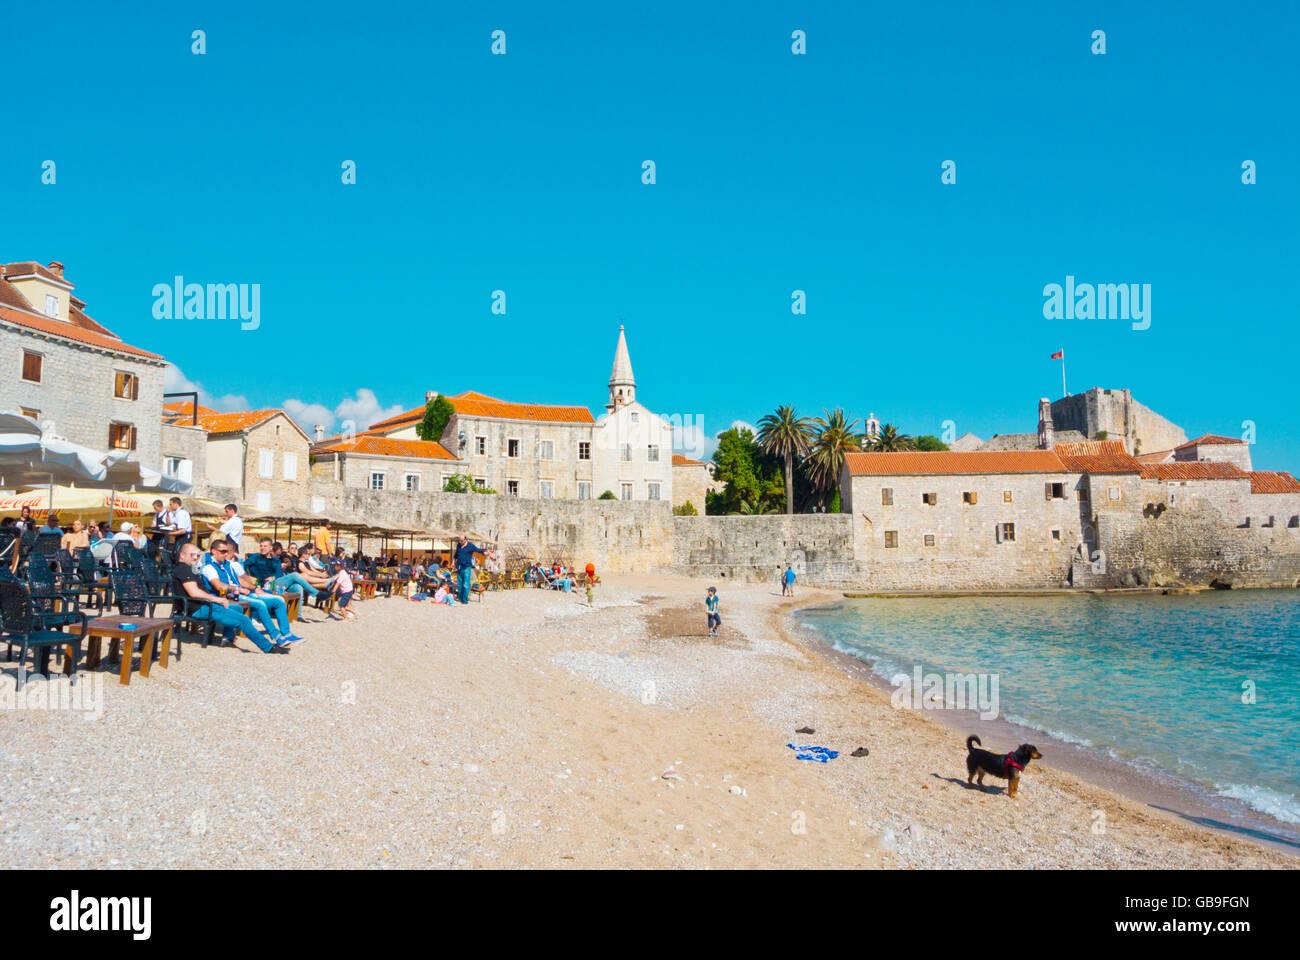 Ricardova glava, Richard's Head beach, at old town, Budva, Montenegro, Europe Stock Photo